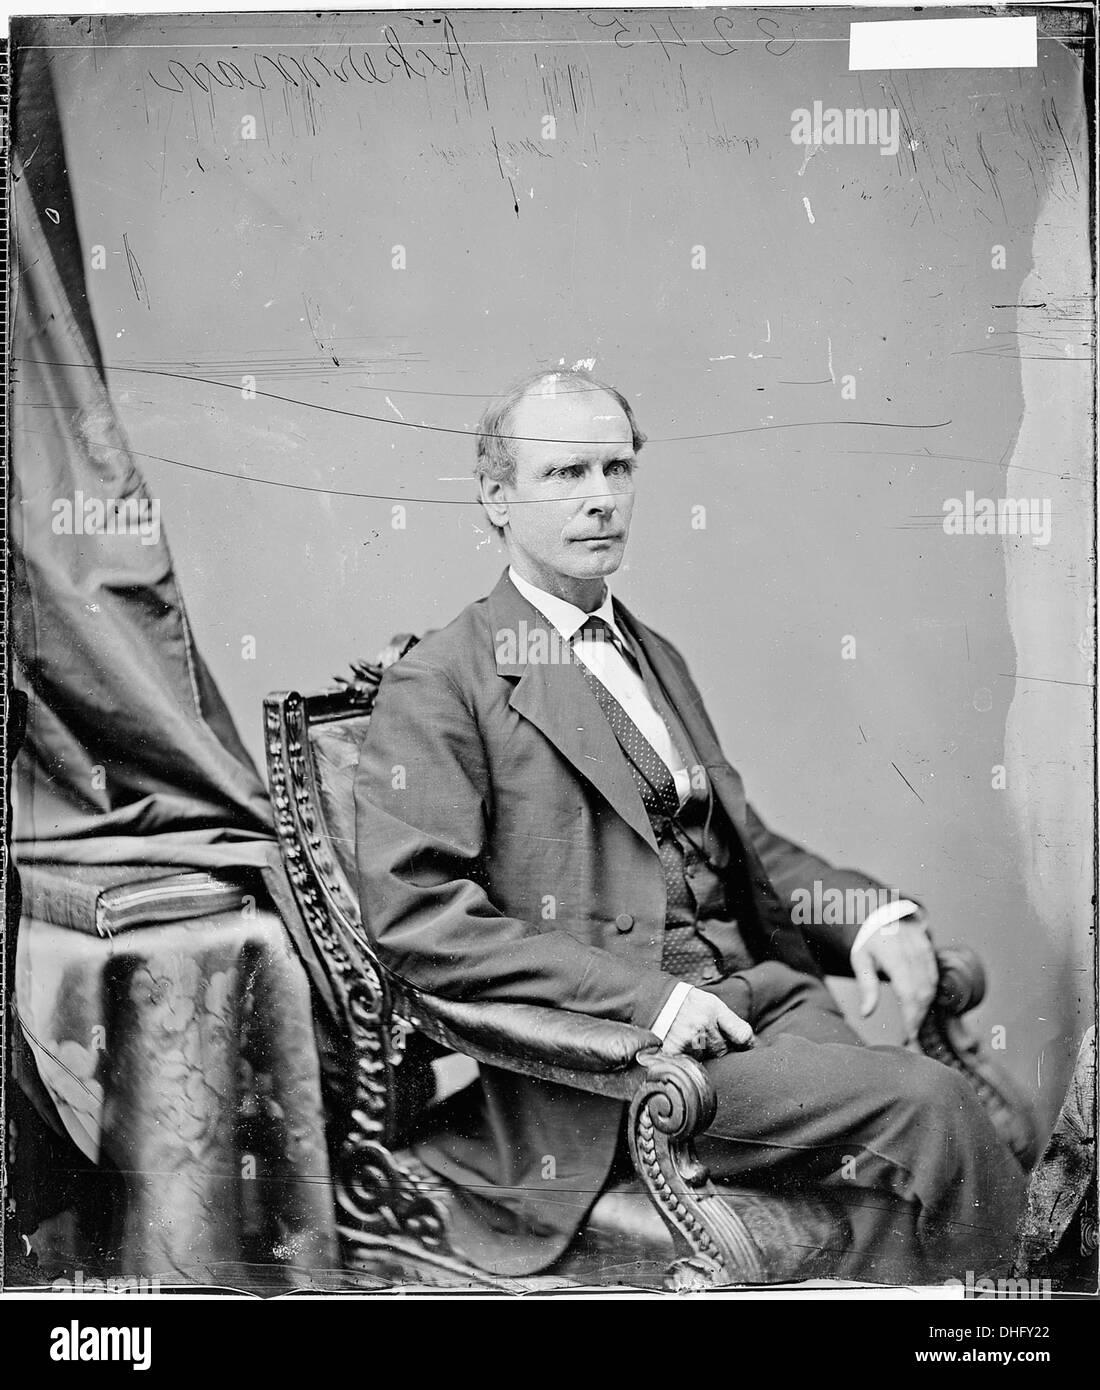 Amos T. Ackerman, Attorney General, U.S 005 - Stock Image